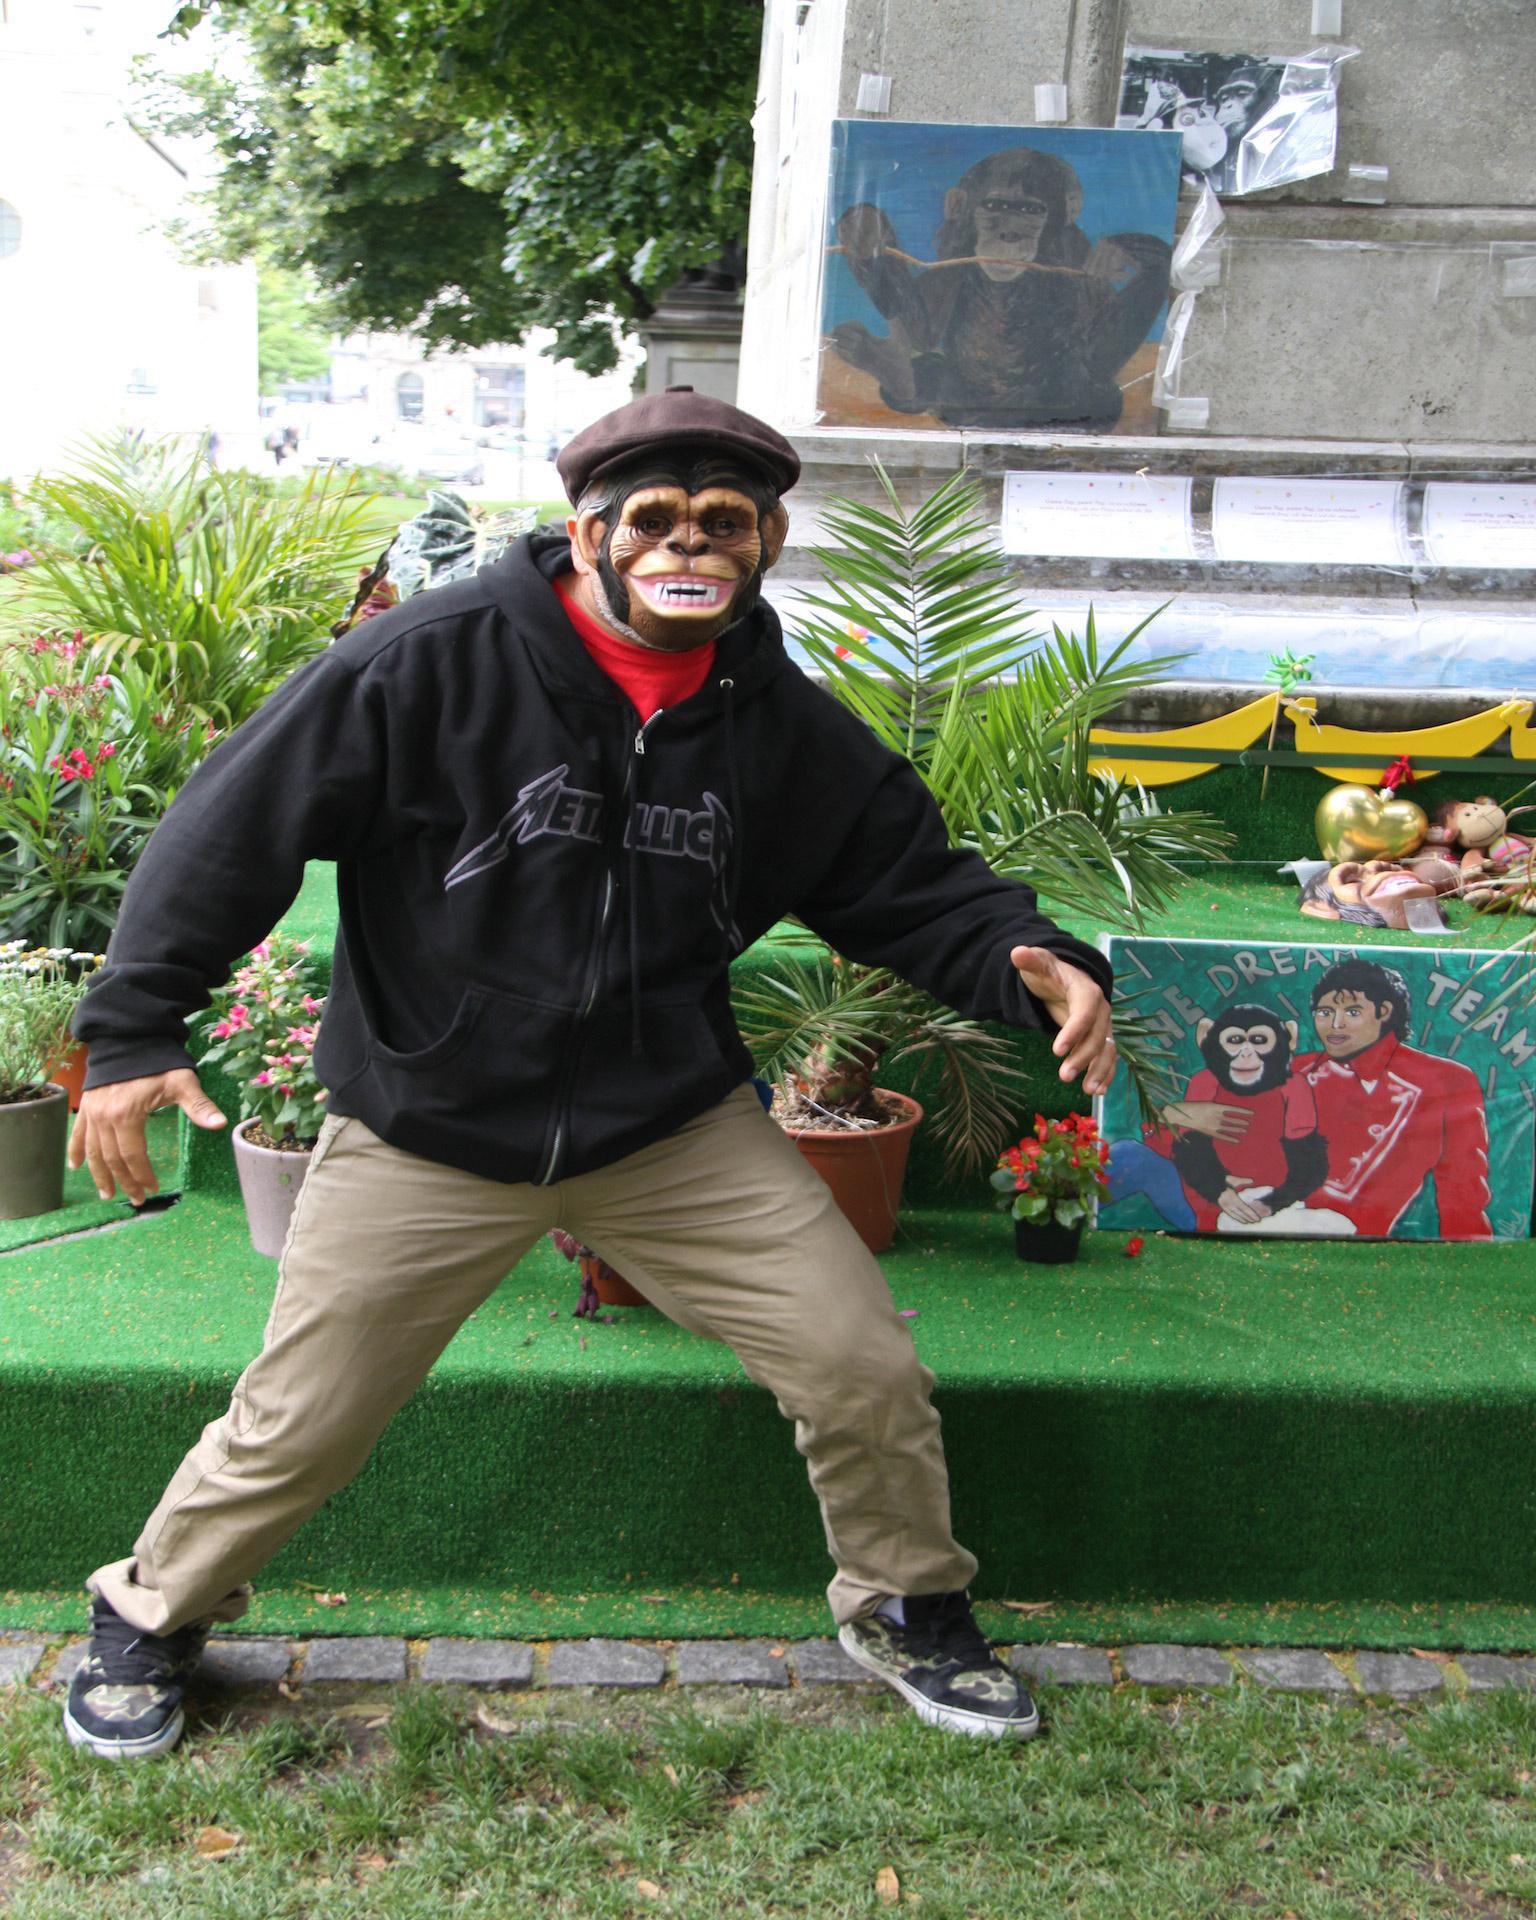 Chimp Champ